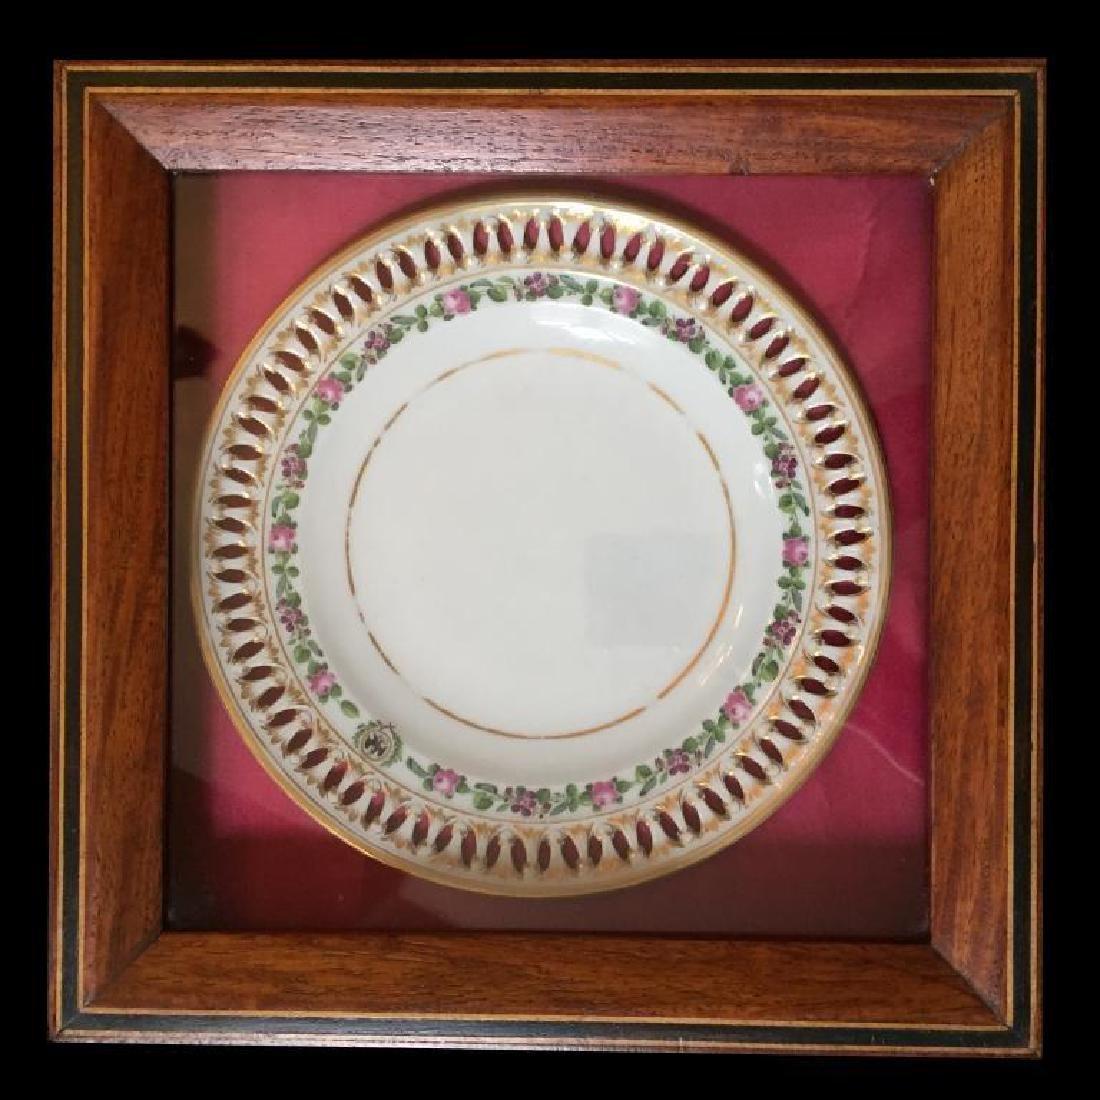 19thc German Meissen Museum Cased Plate - 4